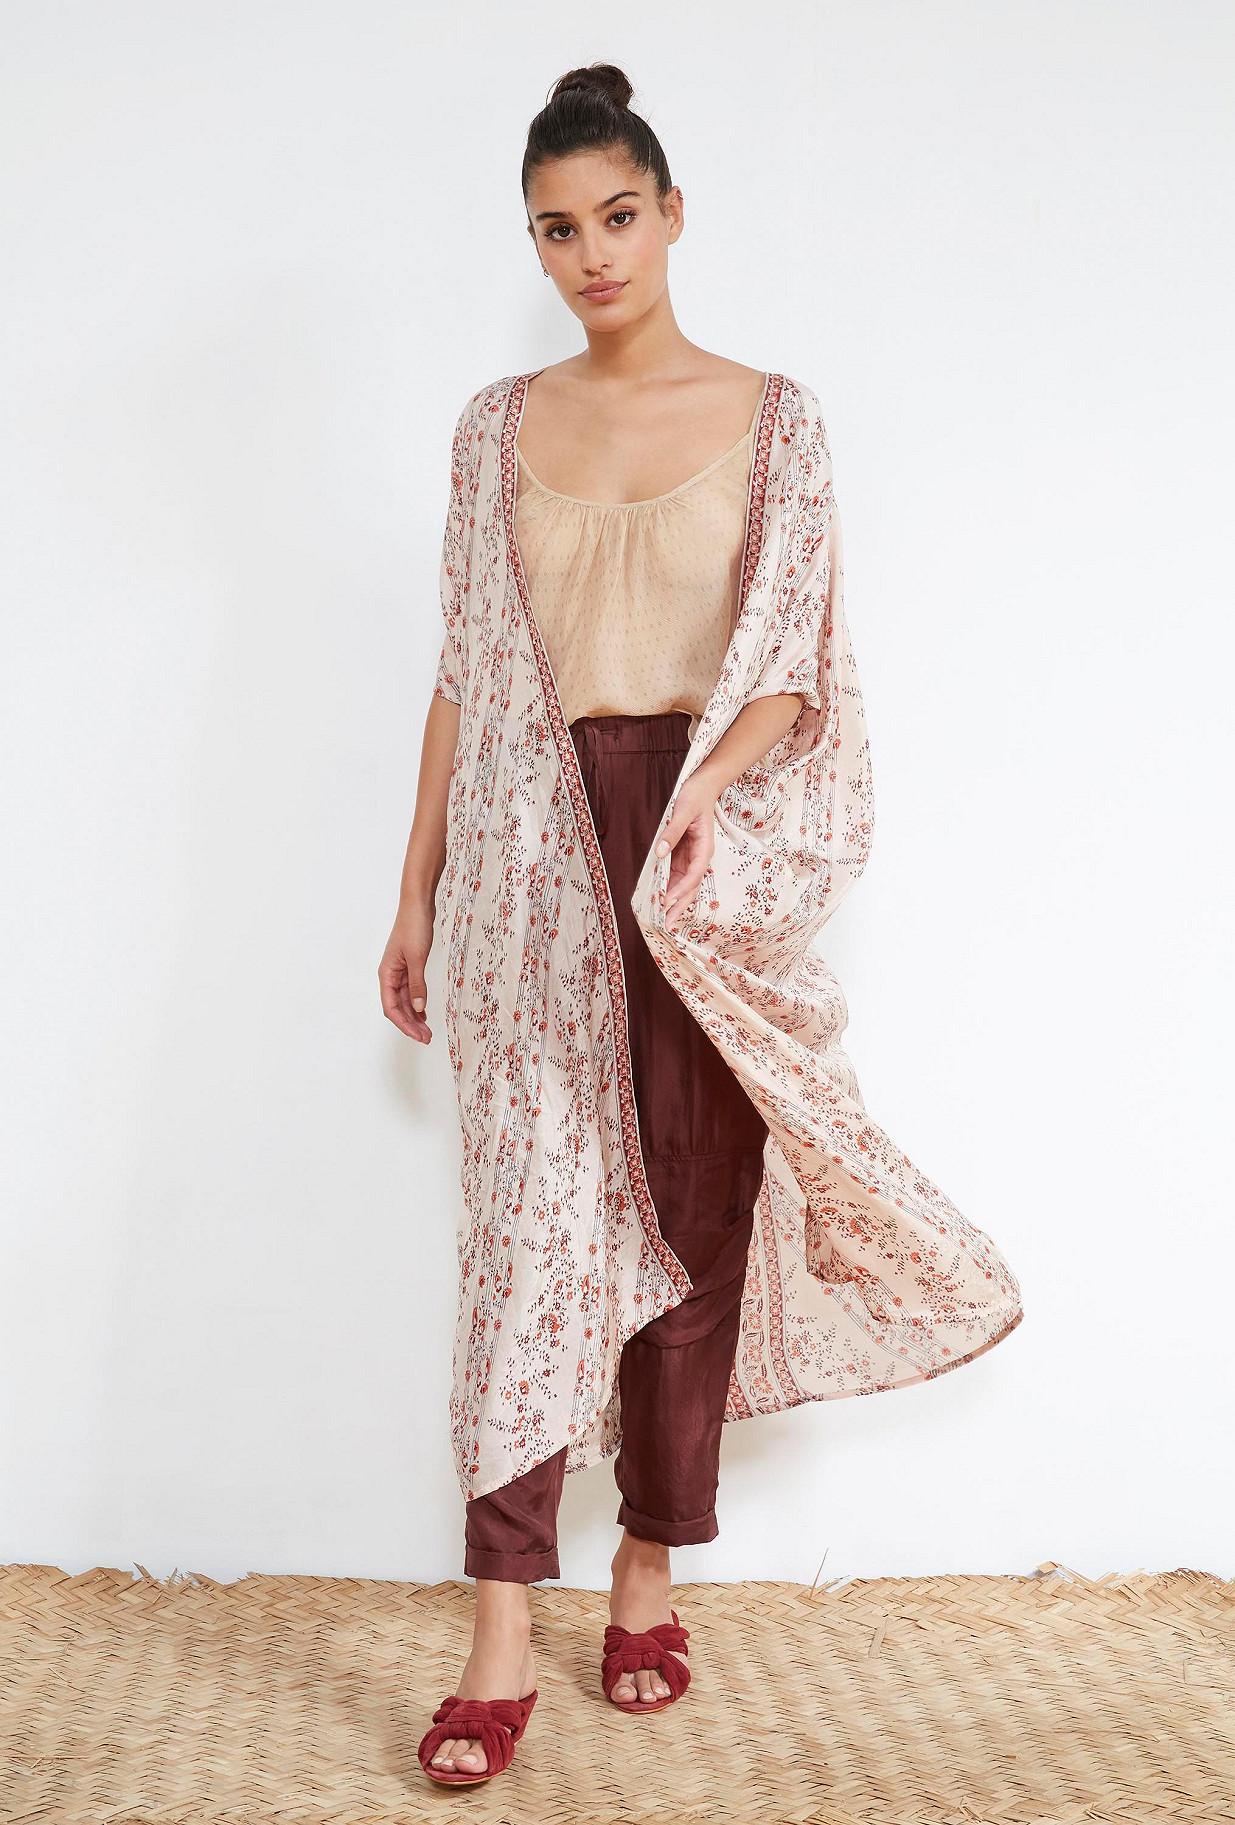 Floral print  KIMONO  Boris Mes demoiselles fashion clothes designer Paris